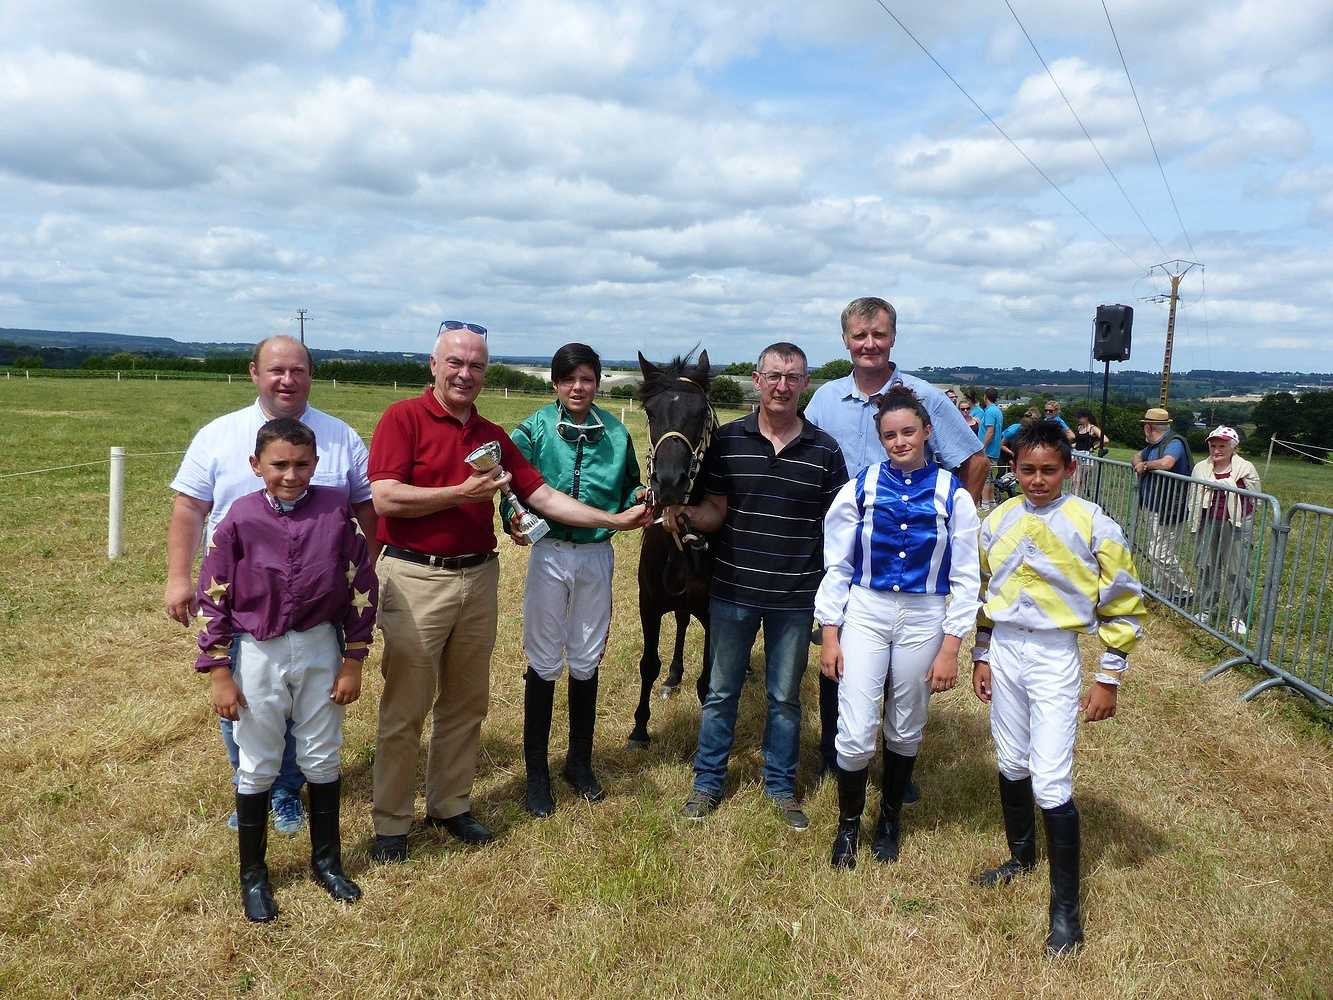 Photos des courses de poneys p1100720002